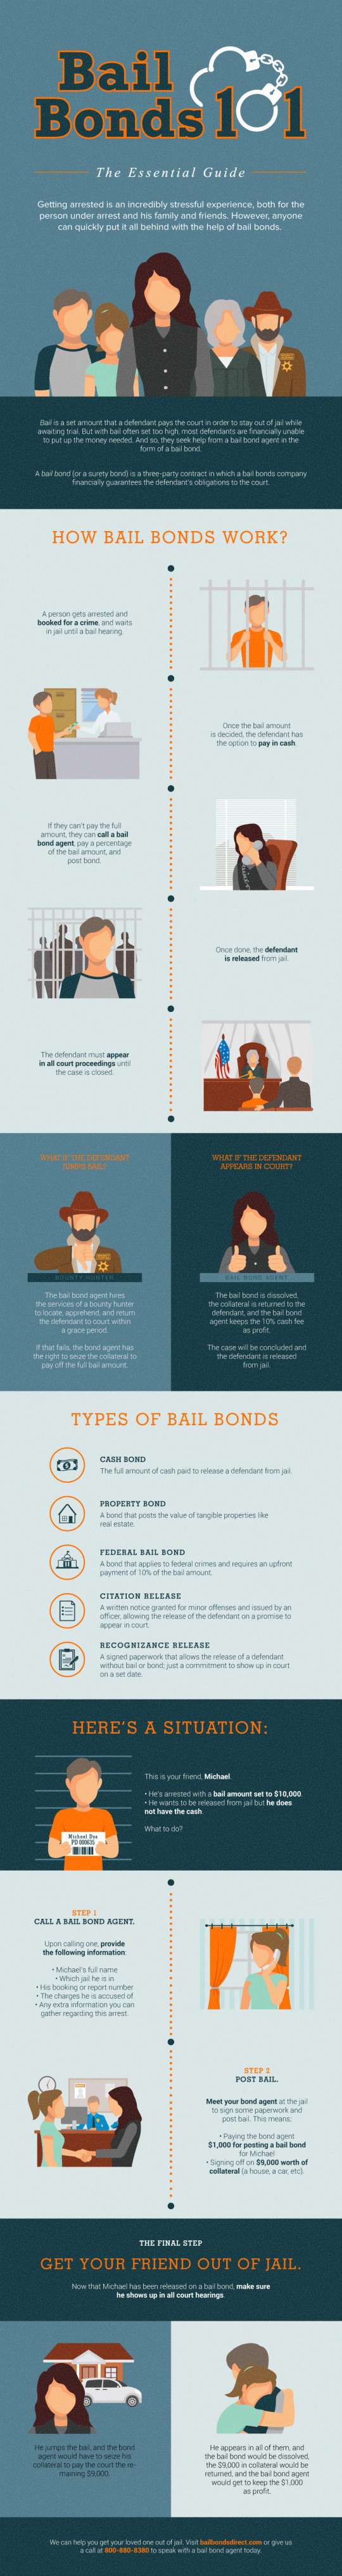 Bail Bonds 101: The Essential Guide